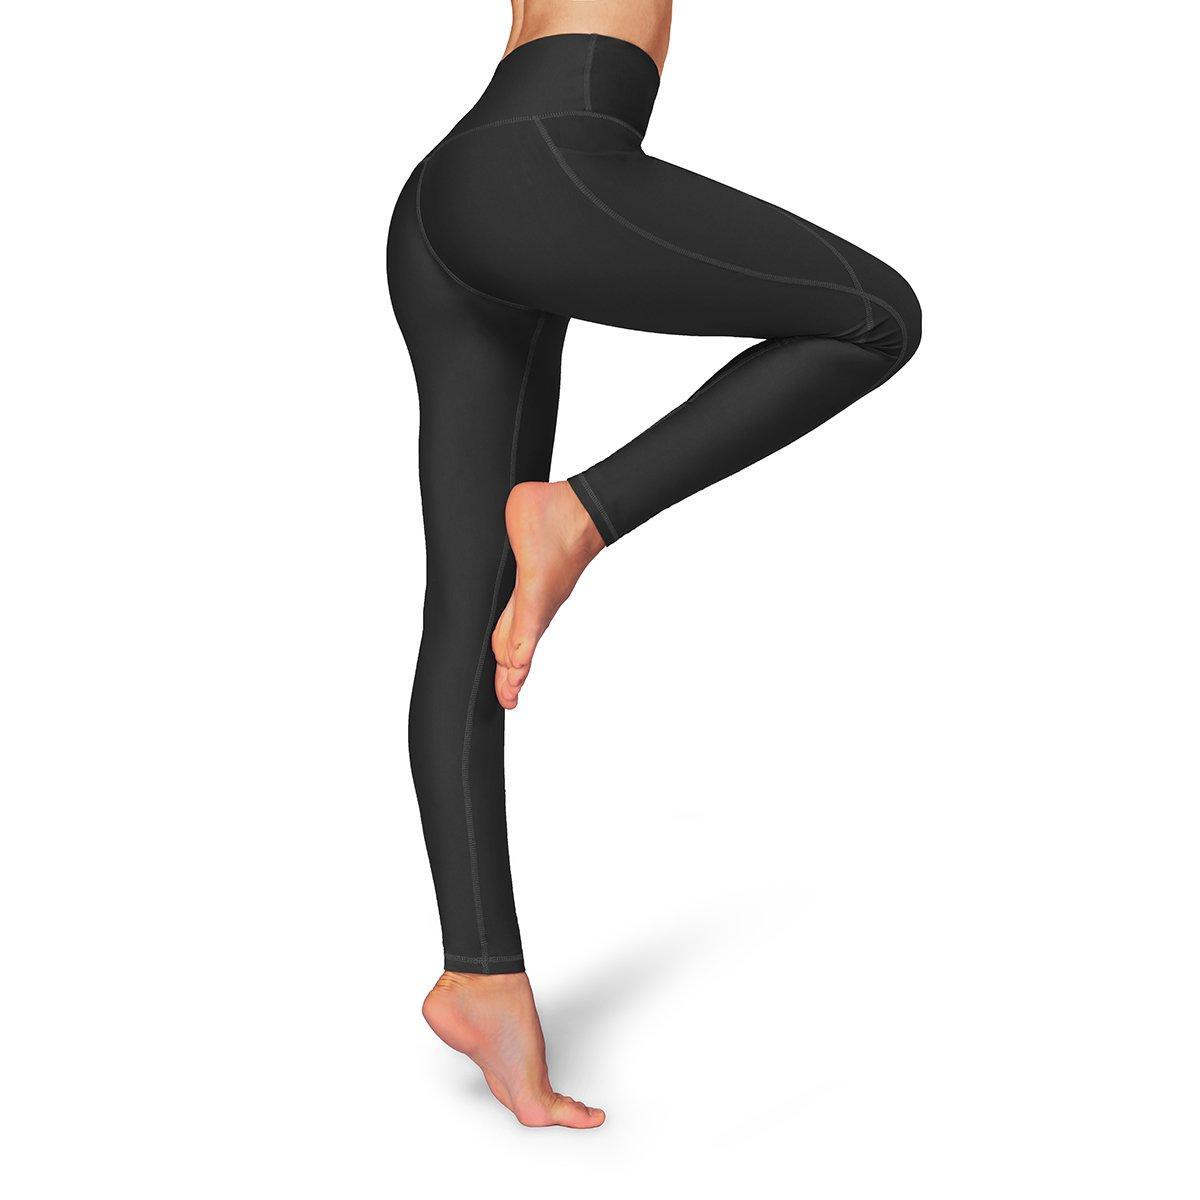 Occffy Cintura Alta Pantalón Deportivo de Mujer Leggings para Running Training Fitness Estiramiento Yoga y Pilates OC01 product image